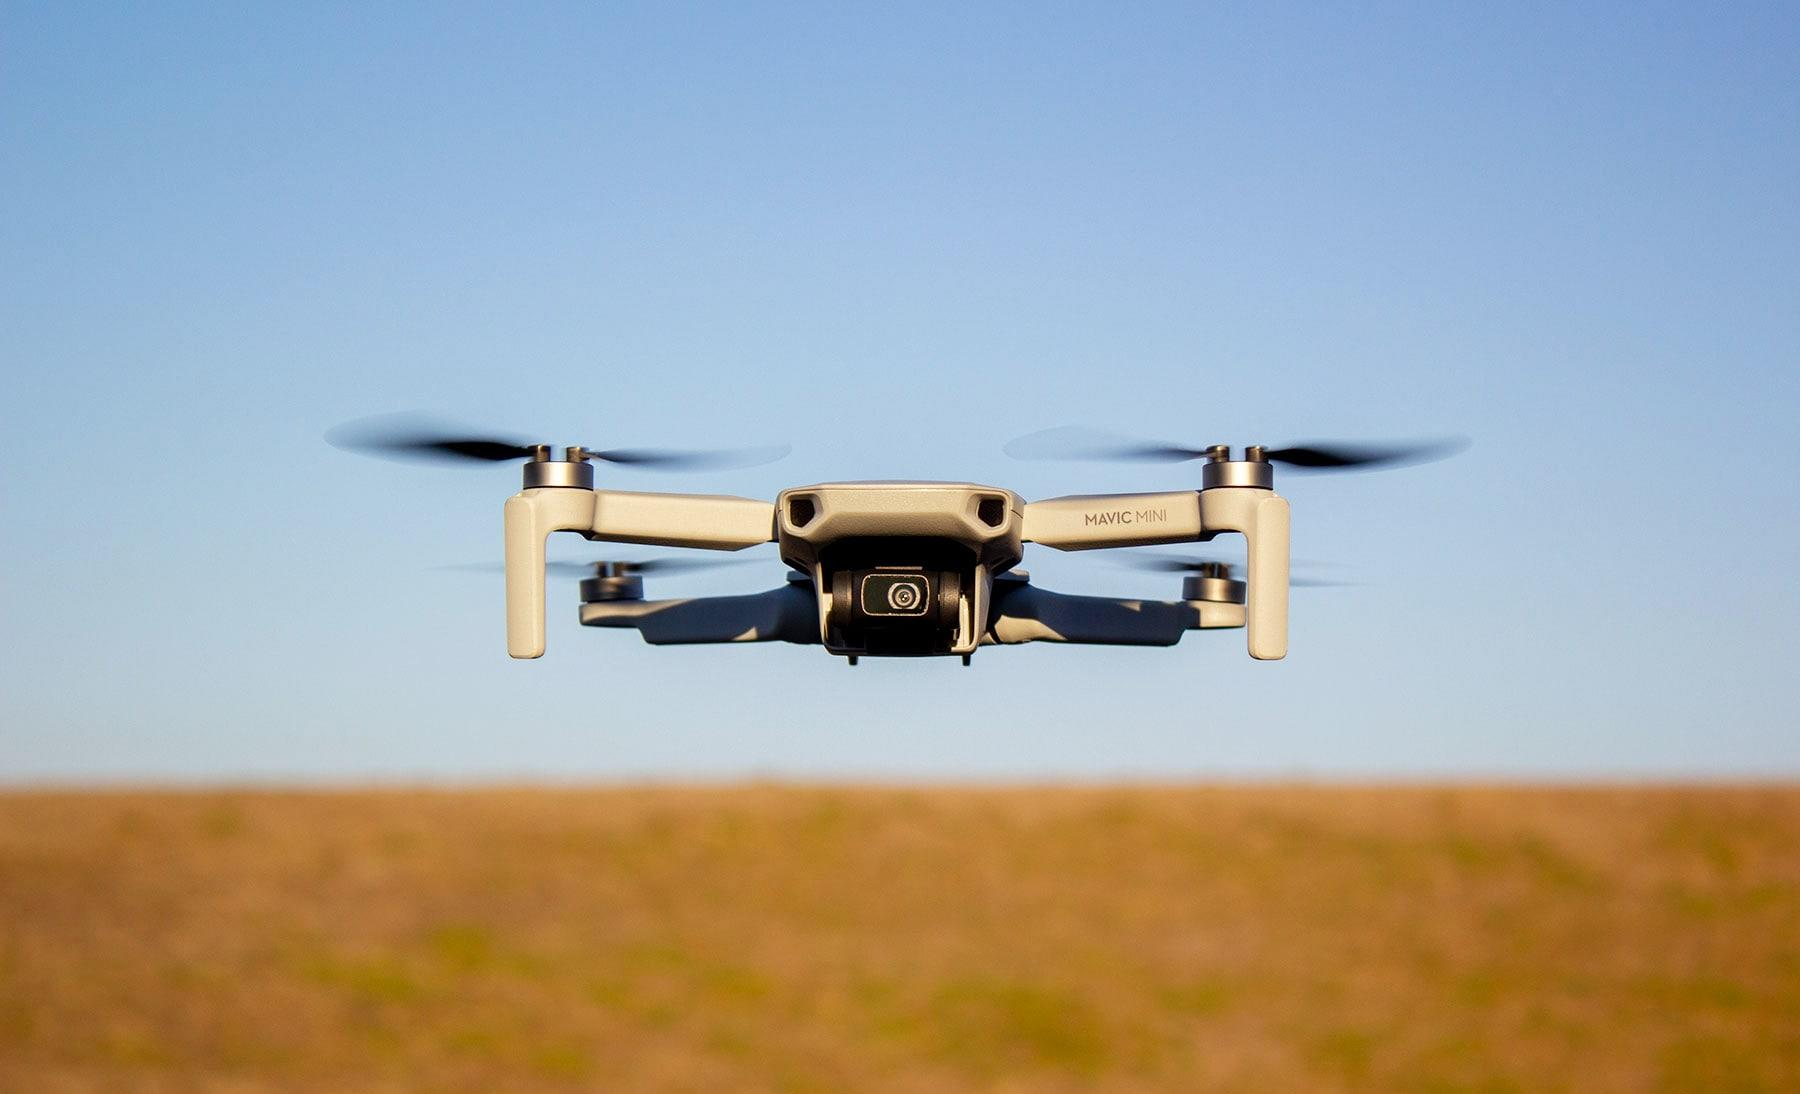 DJI Mavic Mini review: A tiny drone with big ambitions